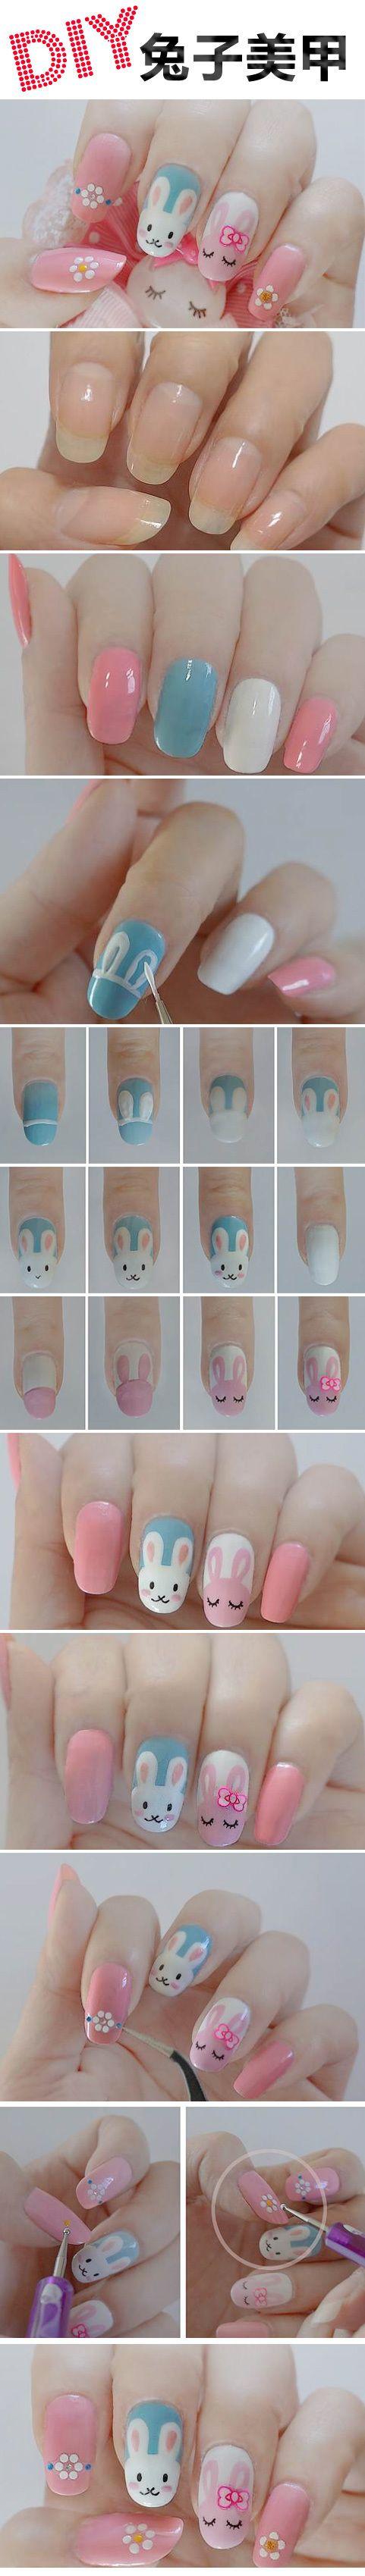 DIY Easter Rabbit Nail DIY Projects | UsefulDIY.com on we heart it / visual bookmark #55628379